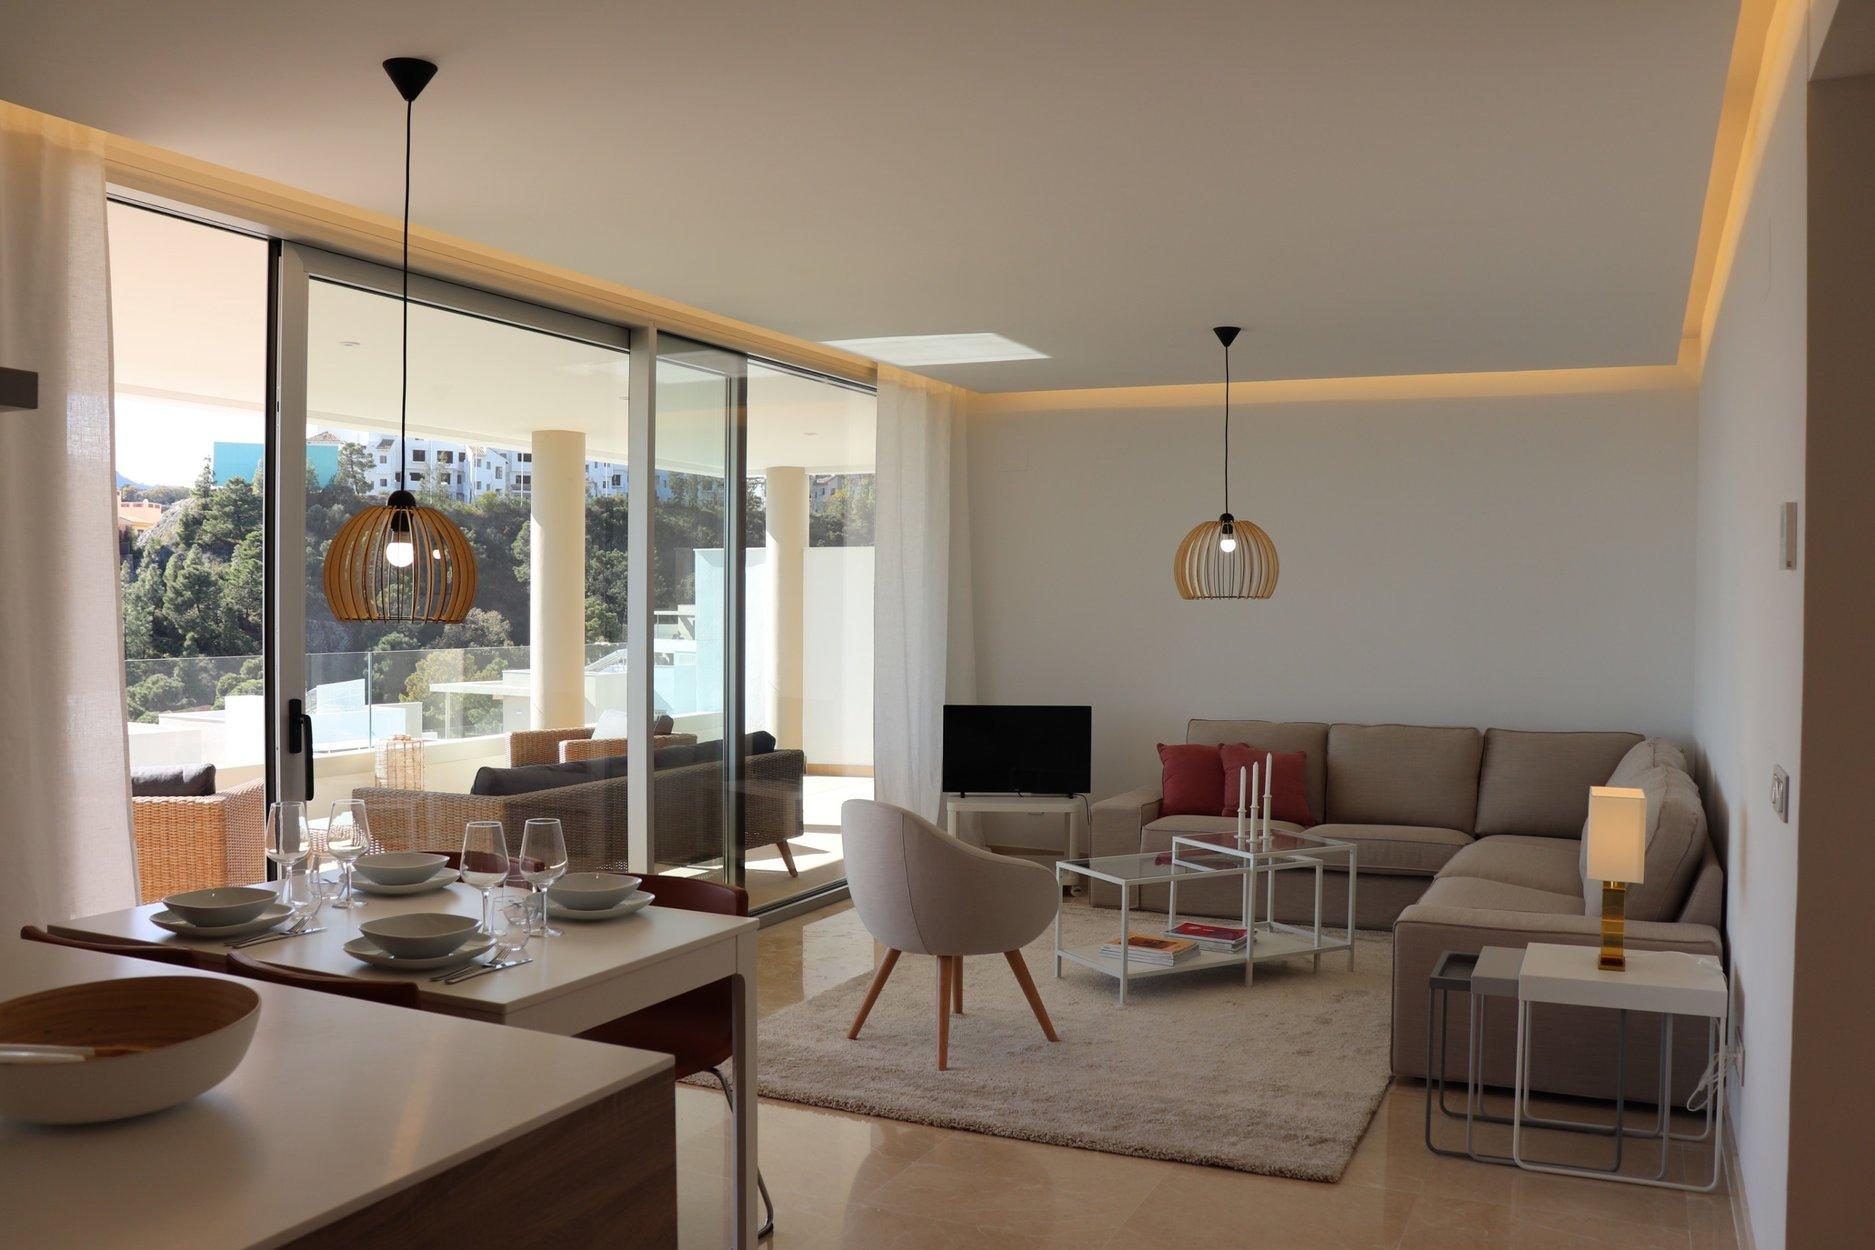 Apartment for sale in Benahavis, Botanic